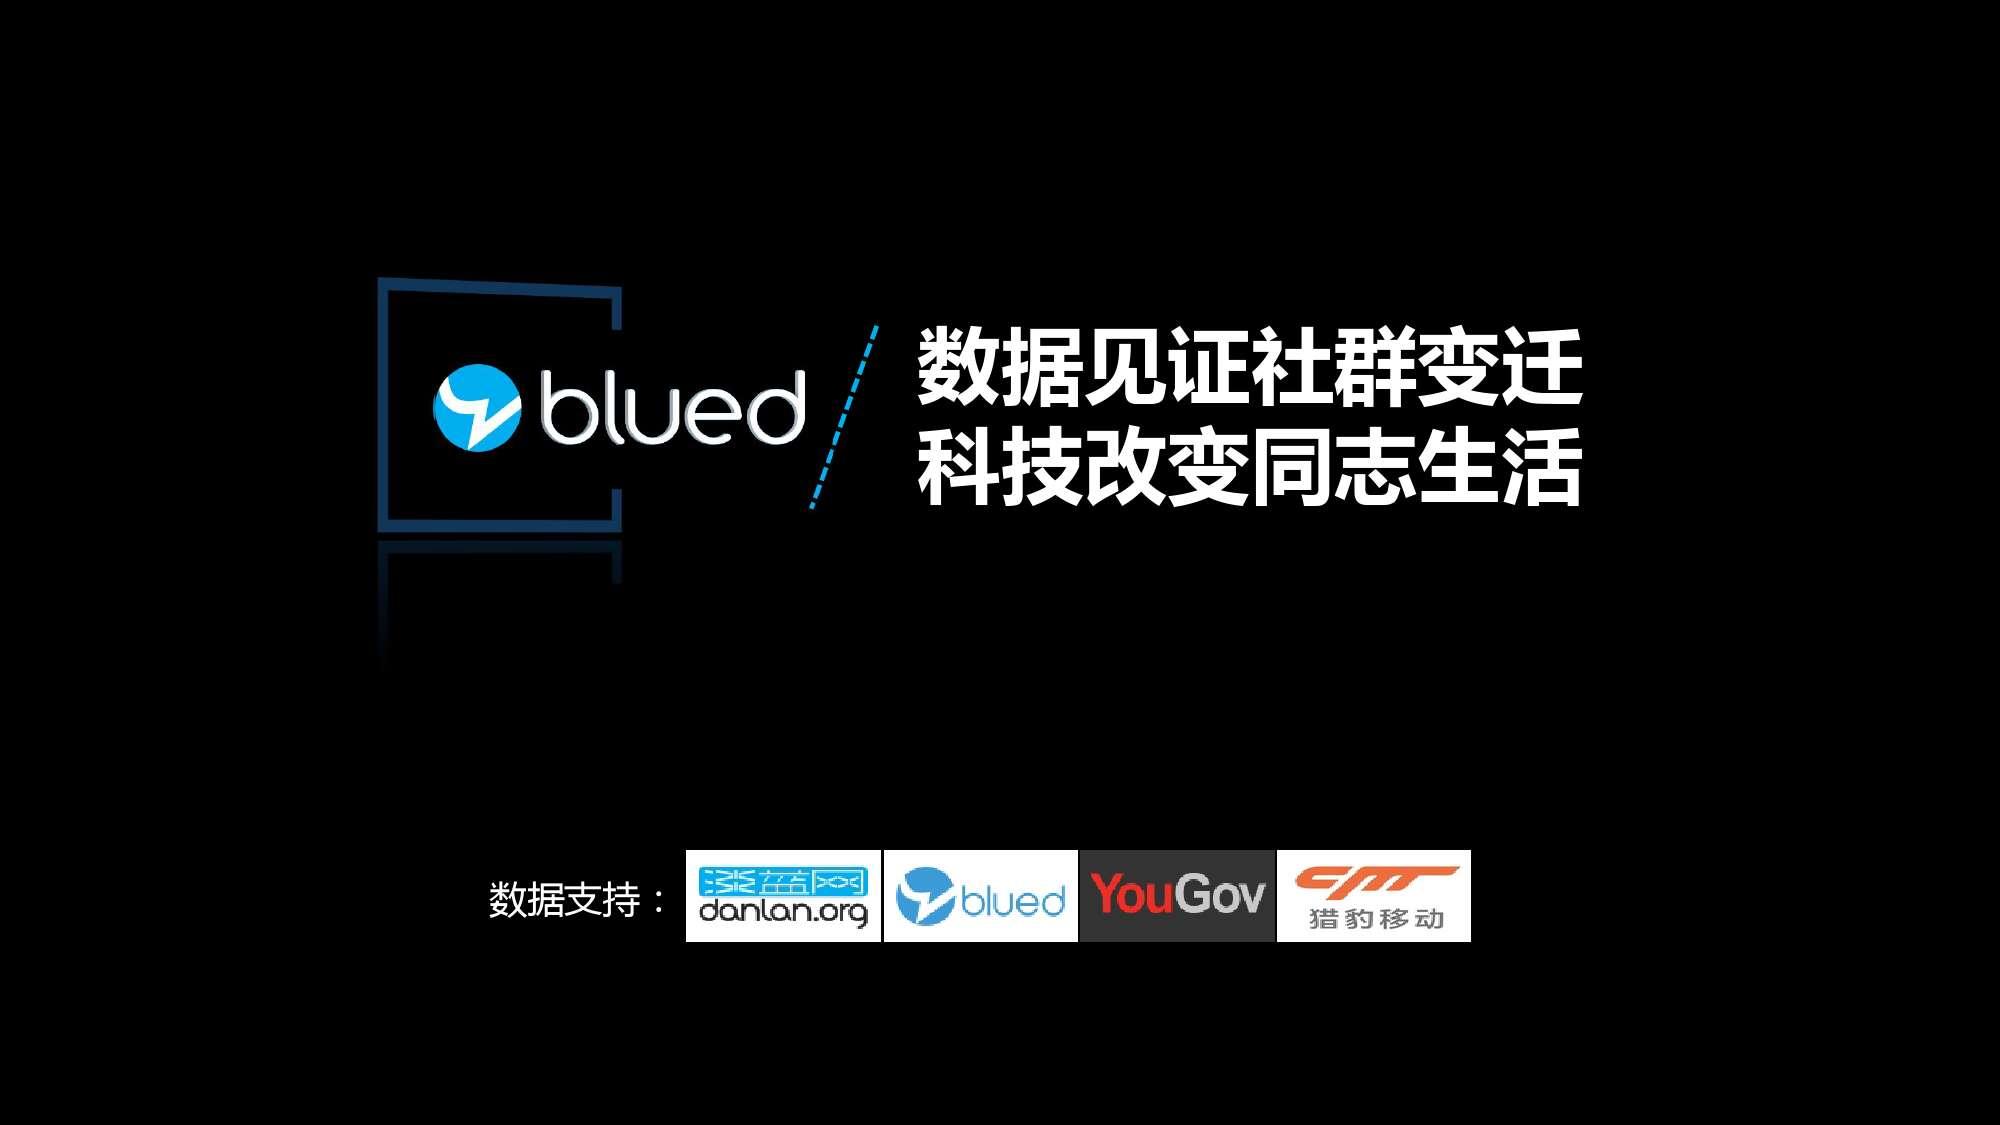 Blued2015中国同志社群大数据白皮书_000029